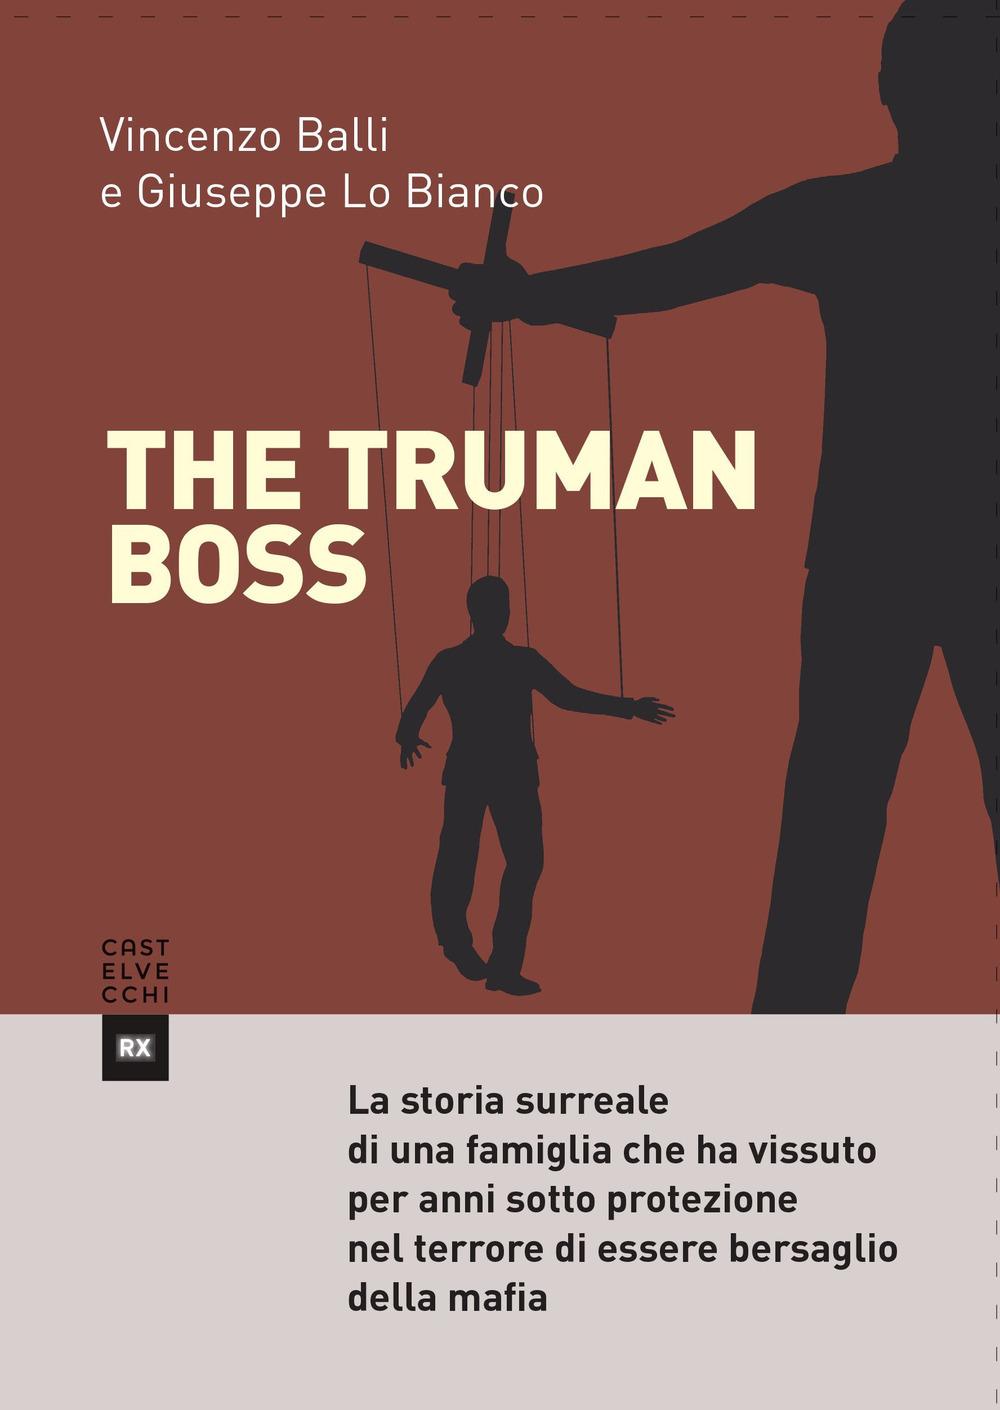 The Truman Boss